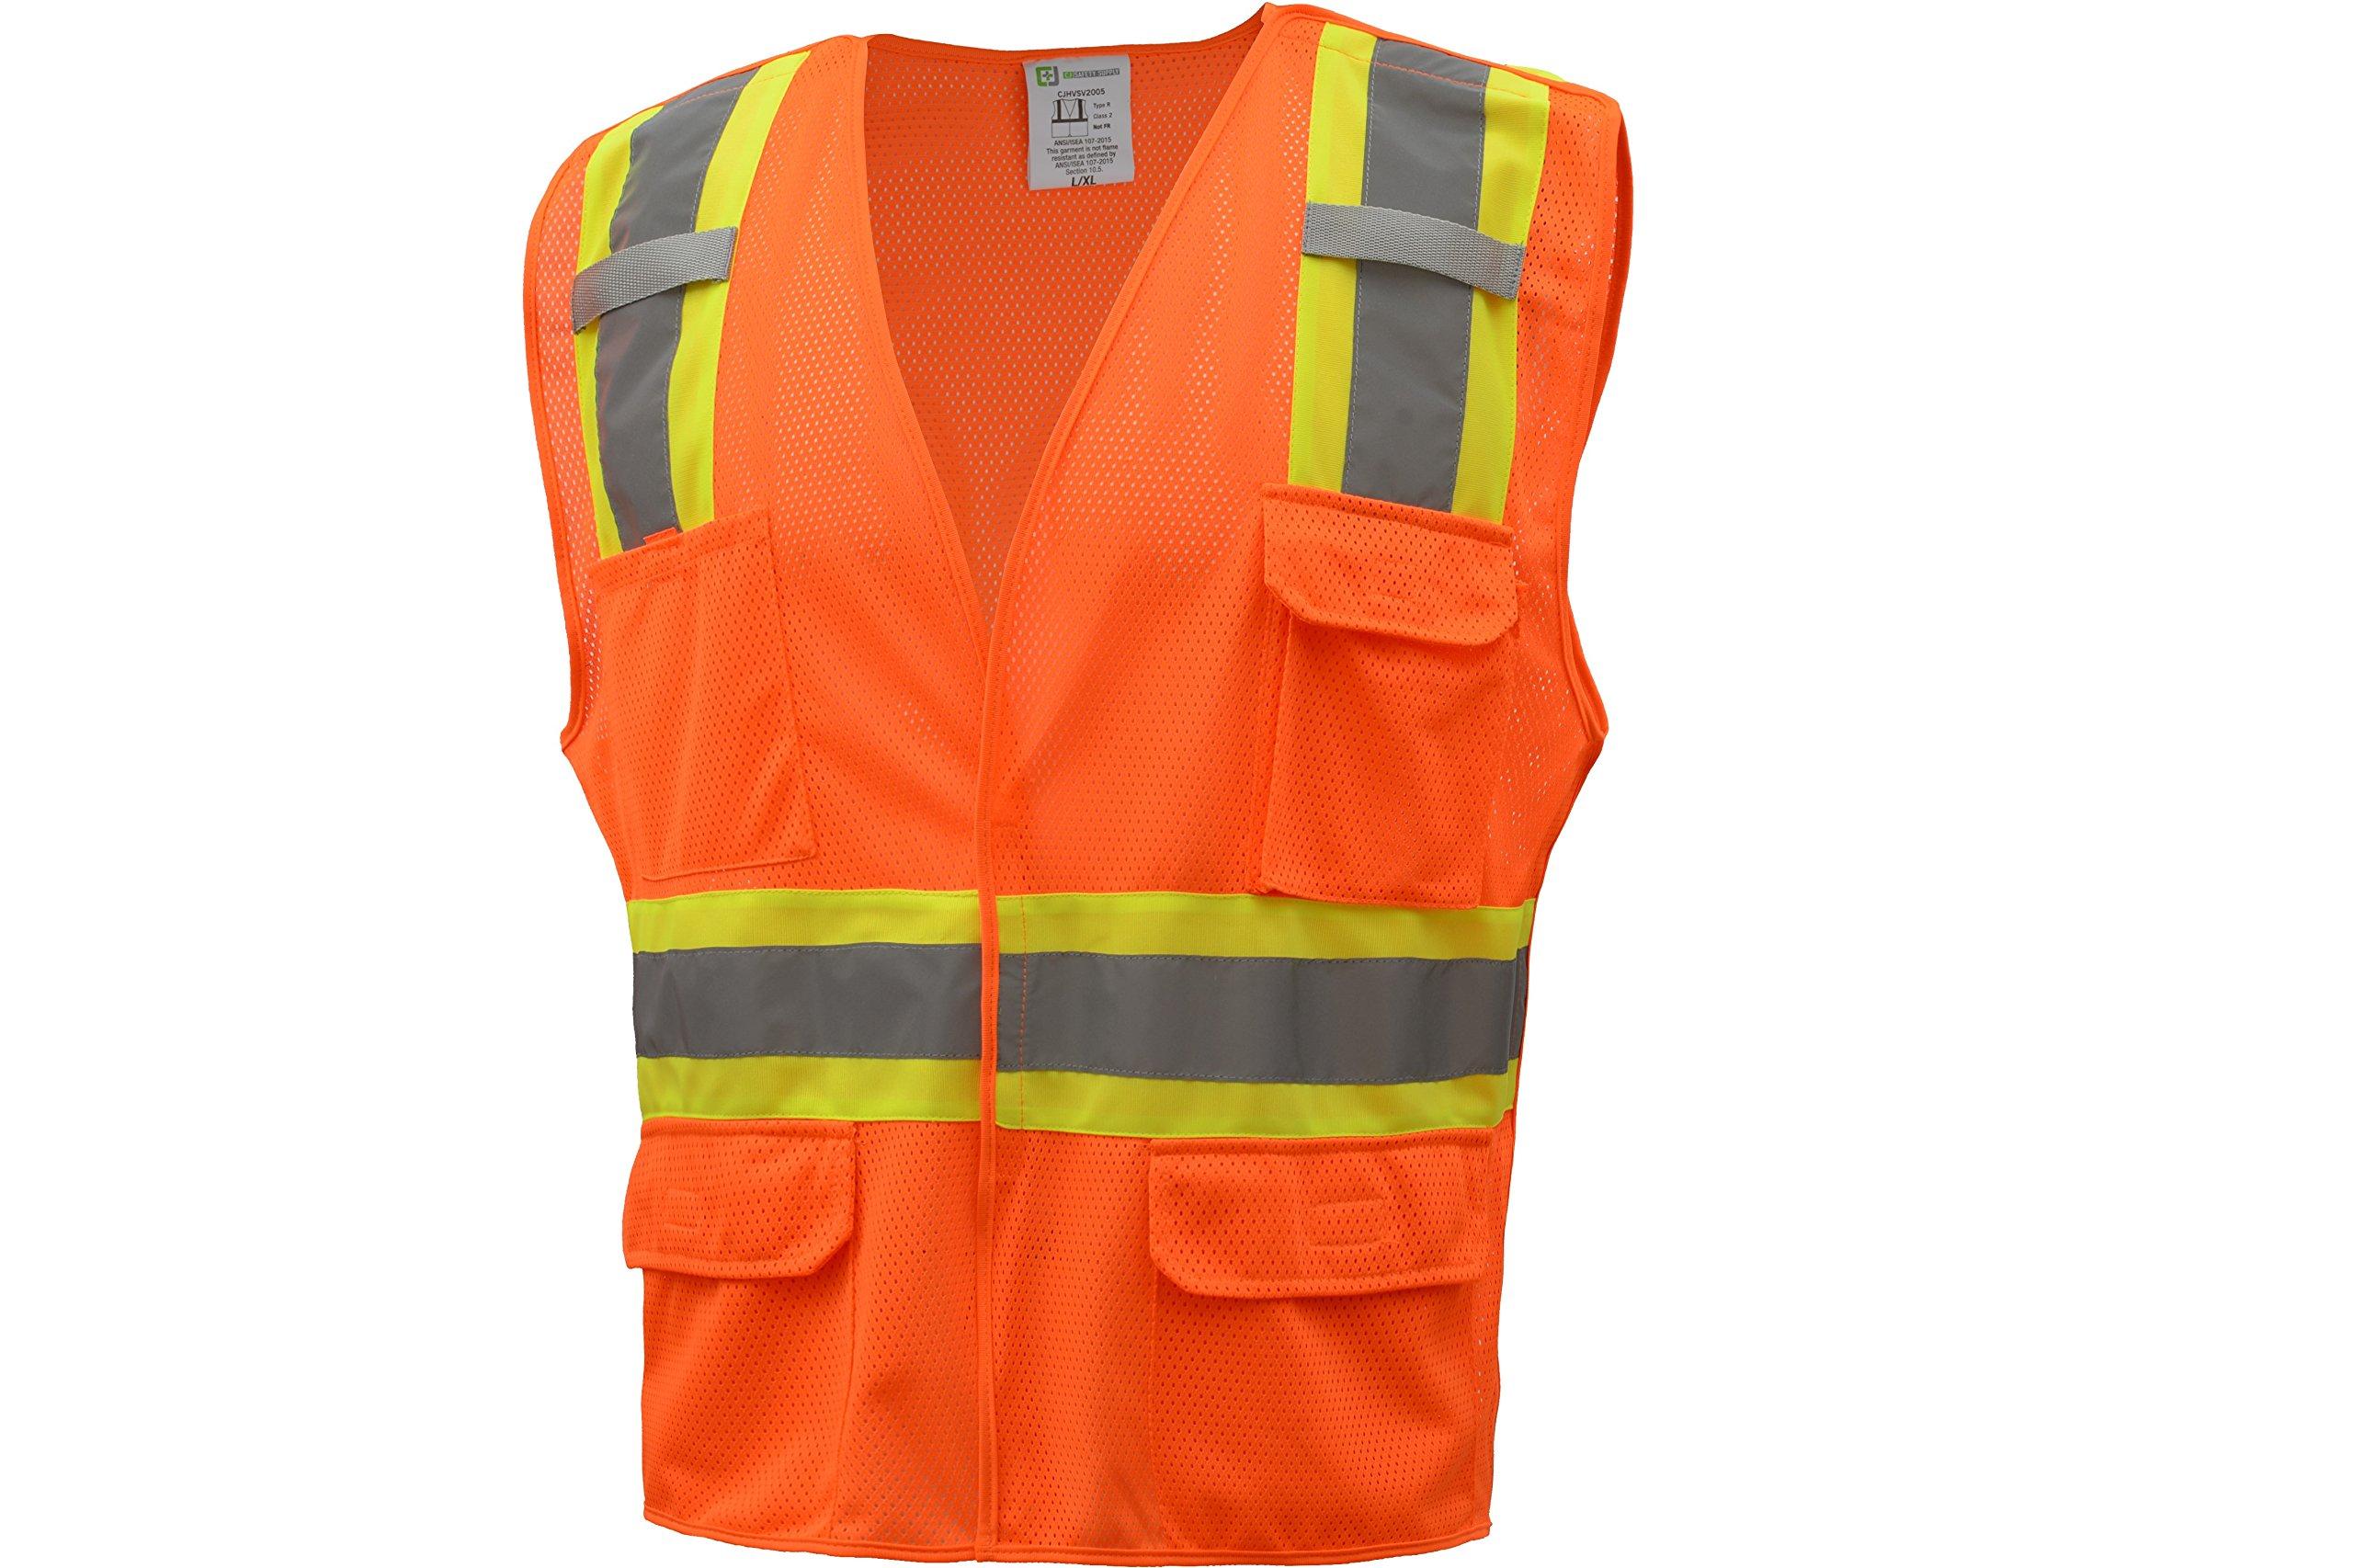 CJ Safety CJHVSV2005 ANSI Class 2 High Visibility Two Tone 5-Points Breakaway Safety Vest 100% Polyester Mesh (Extra Large, Orange)